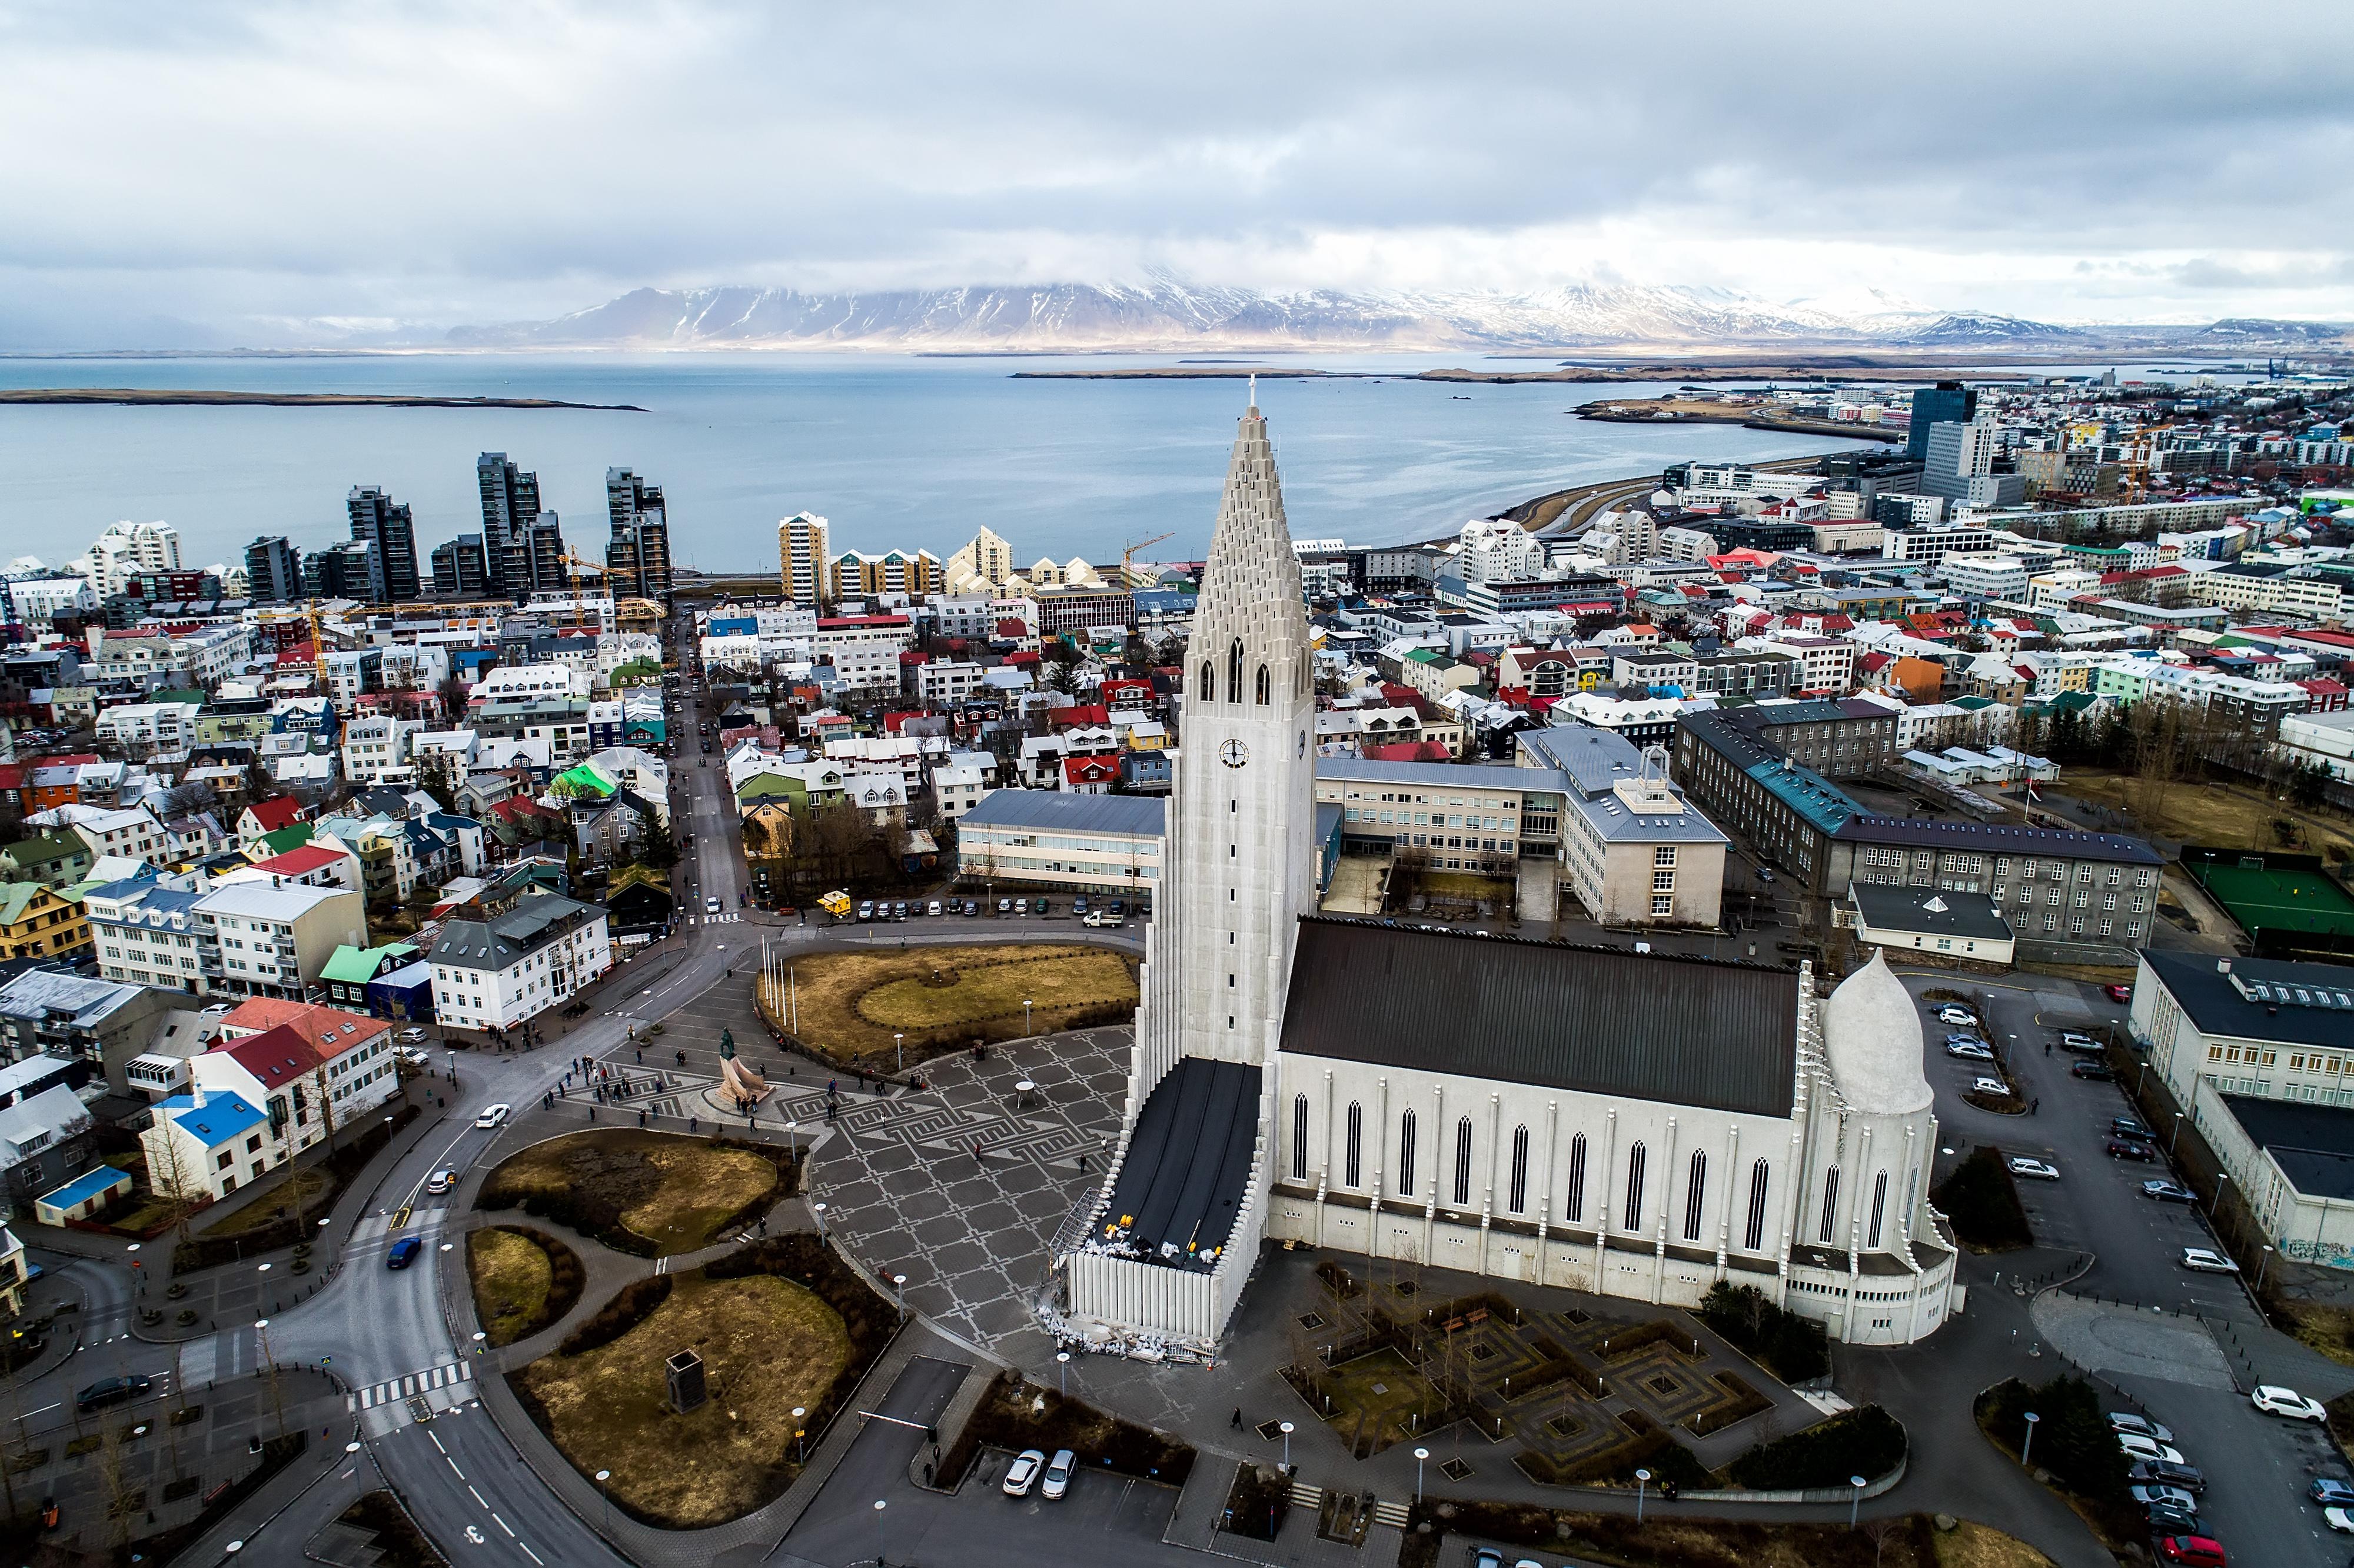 island tagesausflug mit dem rad durch reykjavik. Black Bedroom Furniture Sets. Home Design Ideas